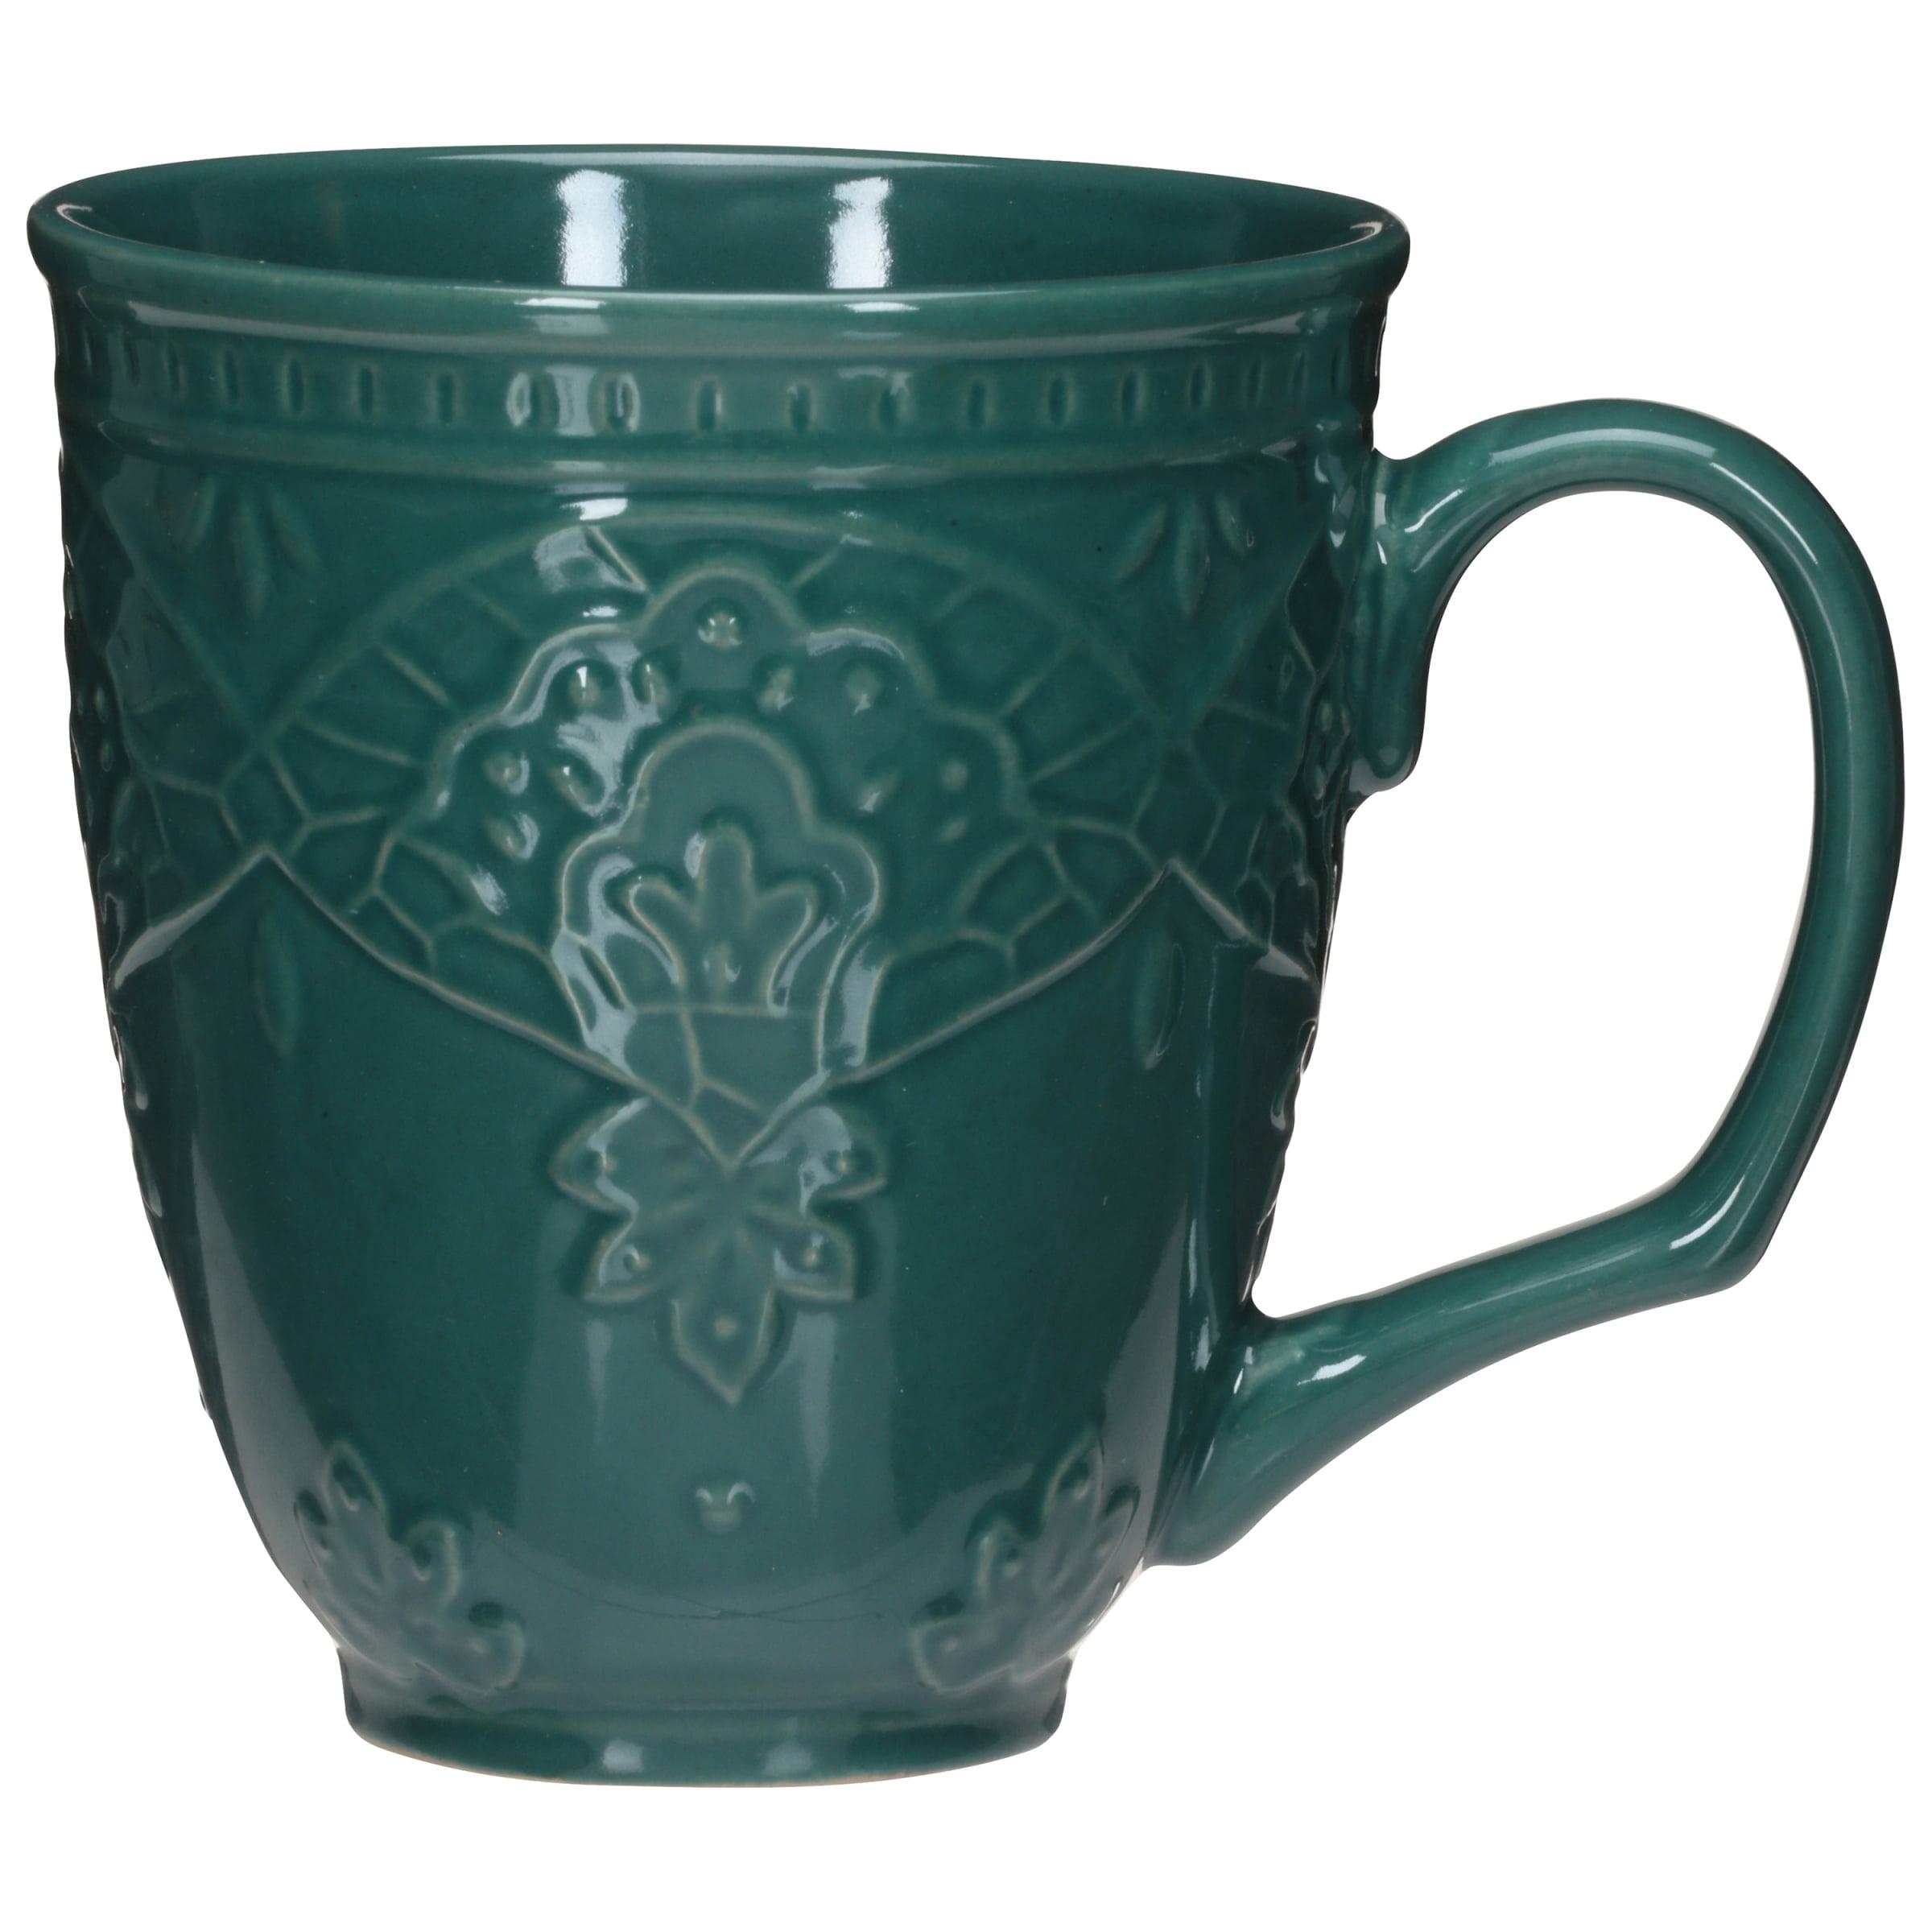 cf5b80a3359 The Pioneer Woman Farmhouse Lace Mug Set, 4-Pack